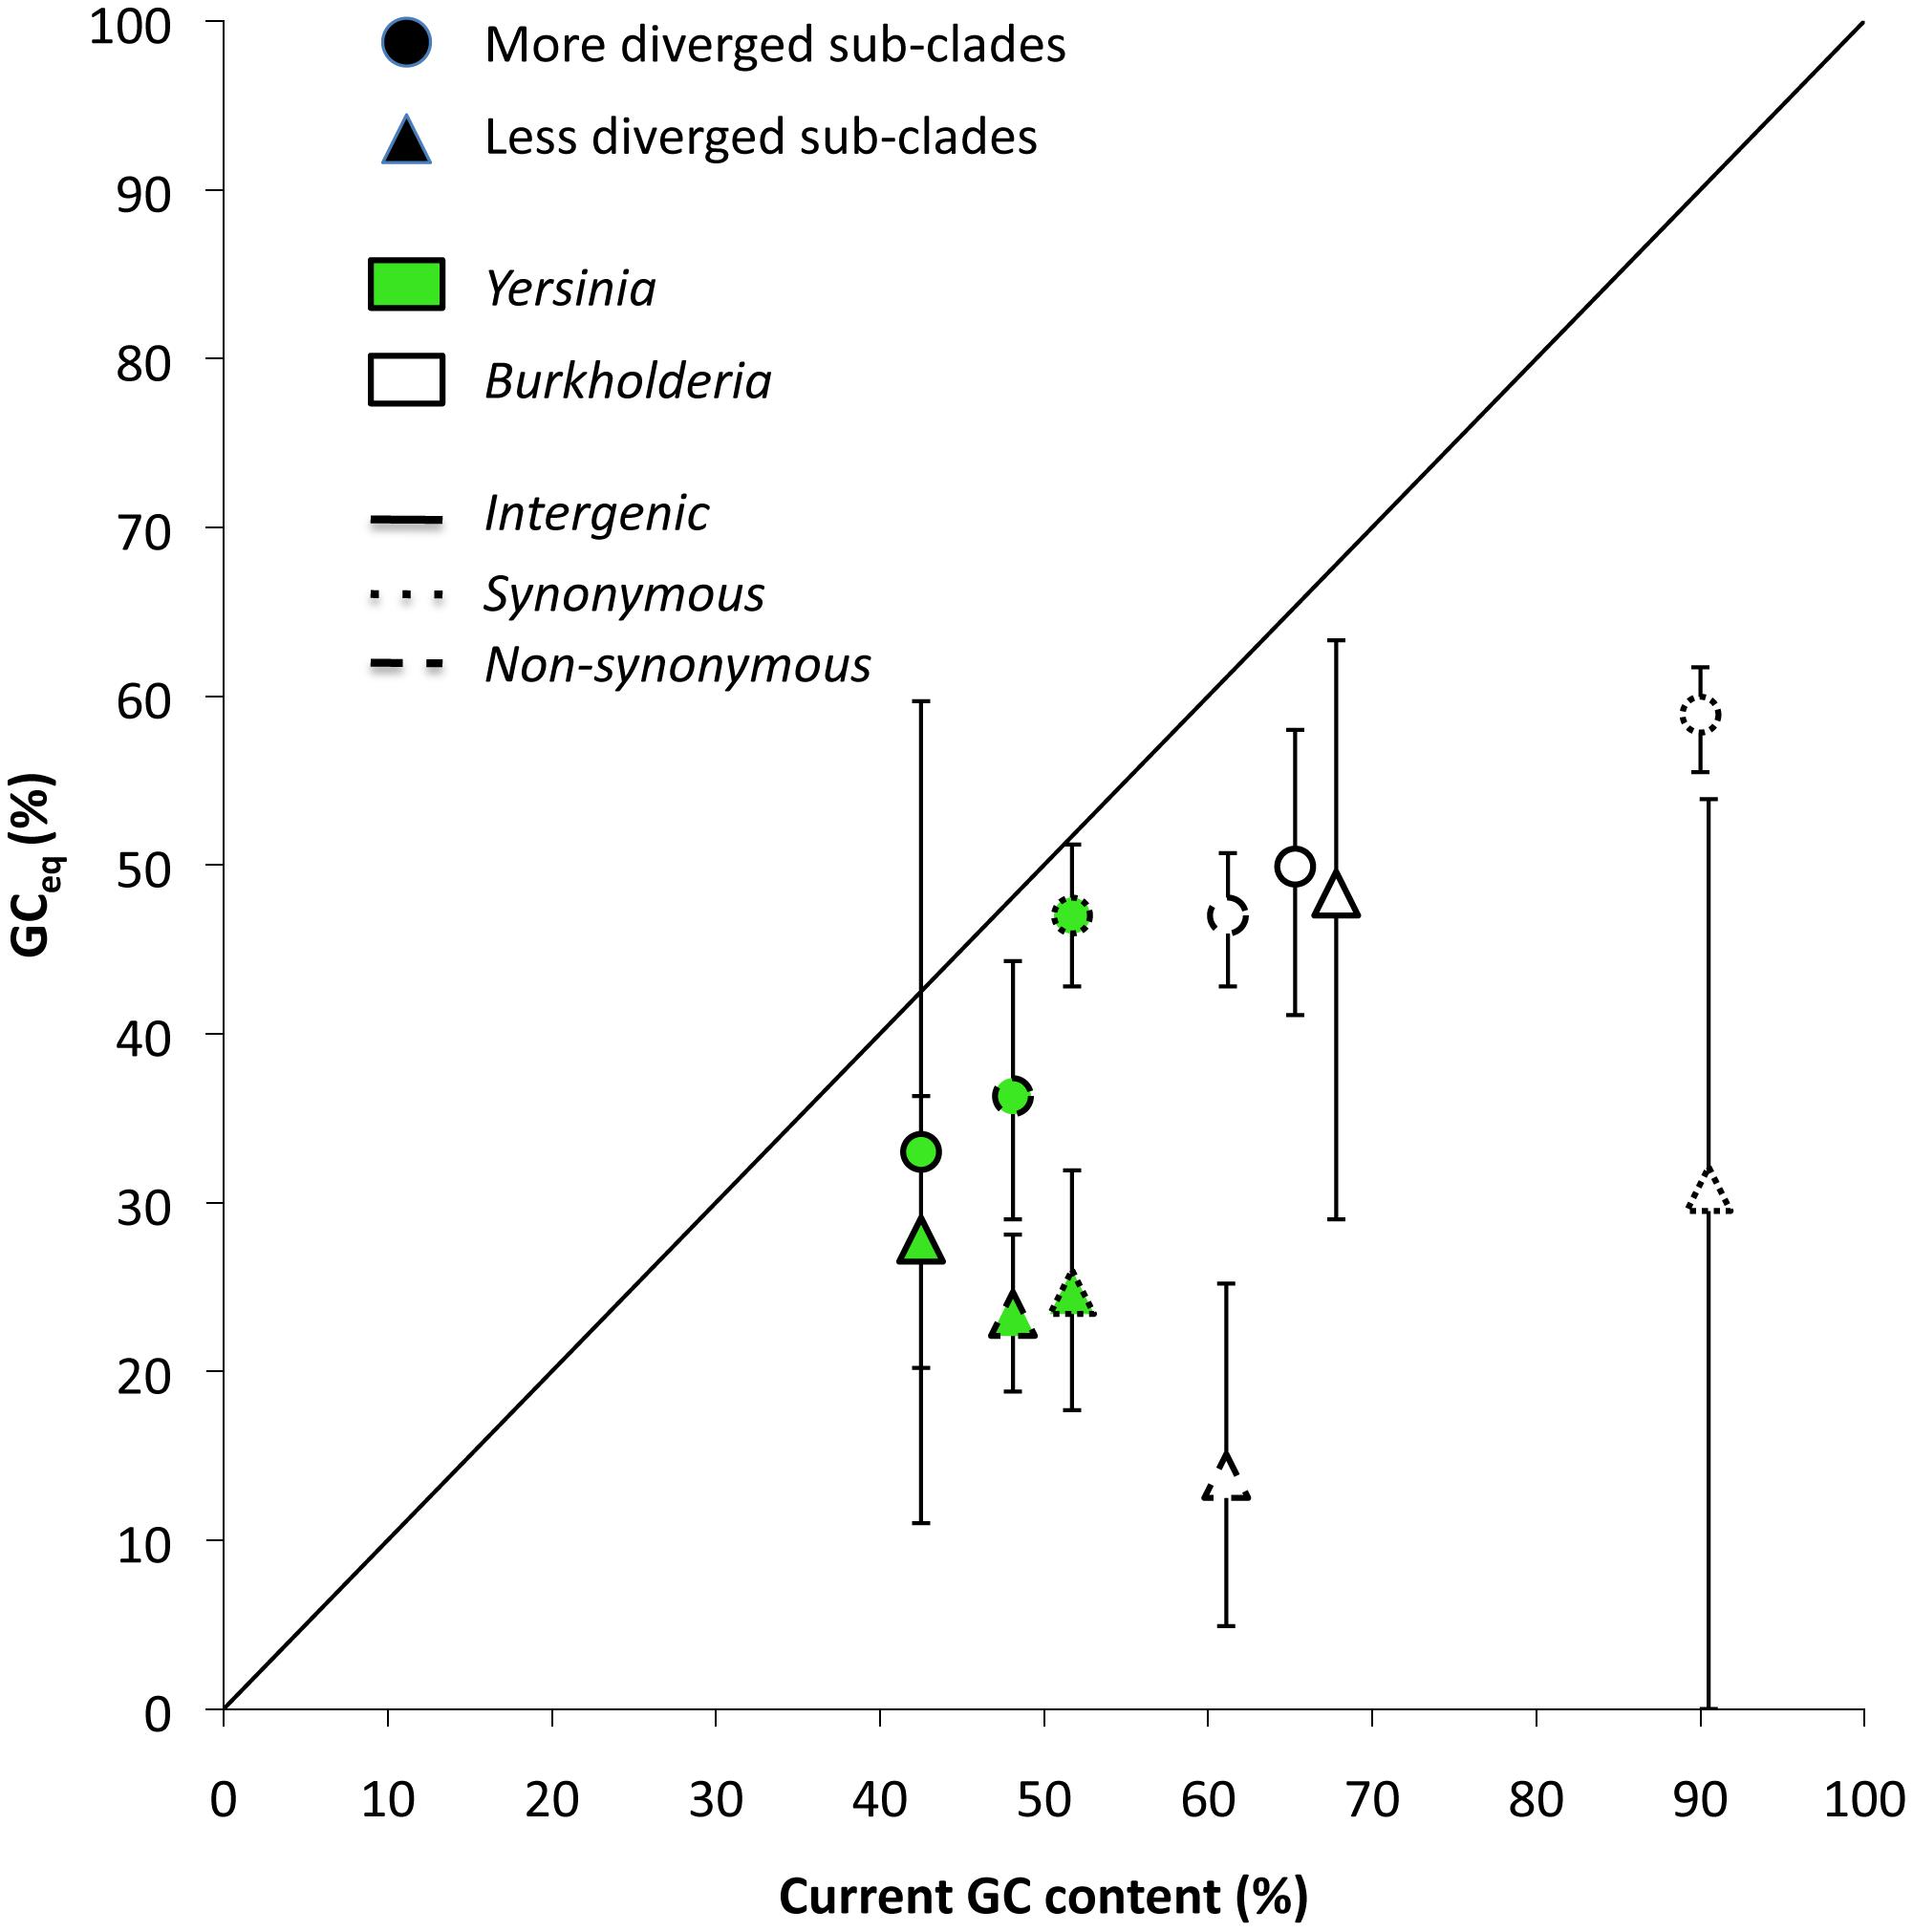 Comparison between GC<sub>eq</sub> calculated using data from clonal pathogens and GC<sub>eq</sub> calculated using data from more diverged lineages.